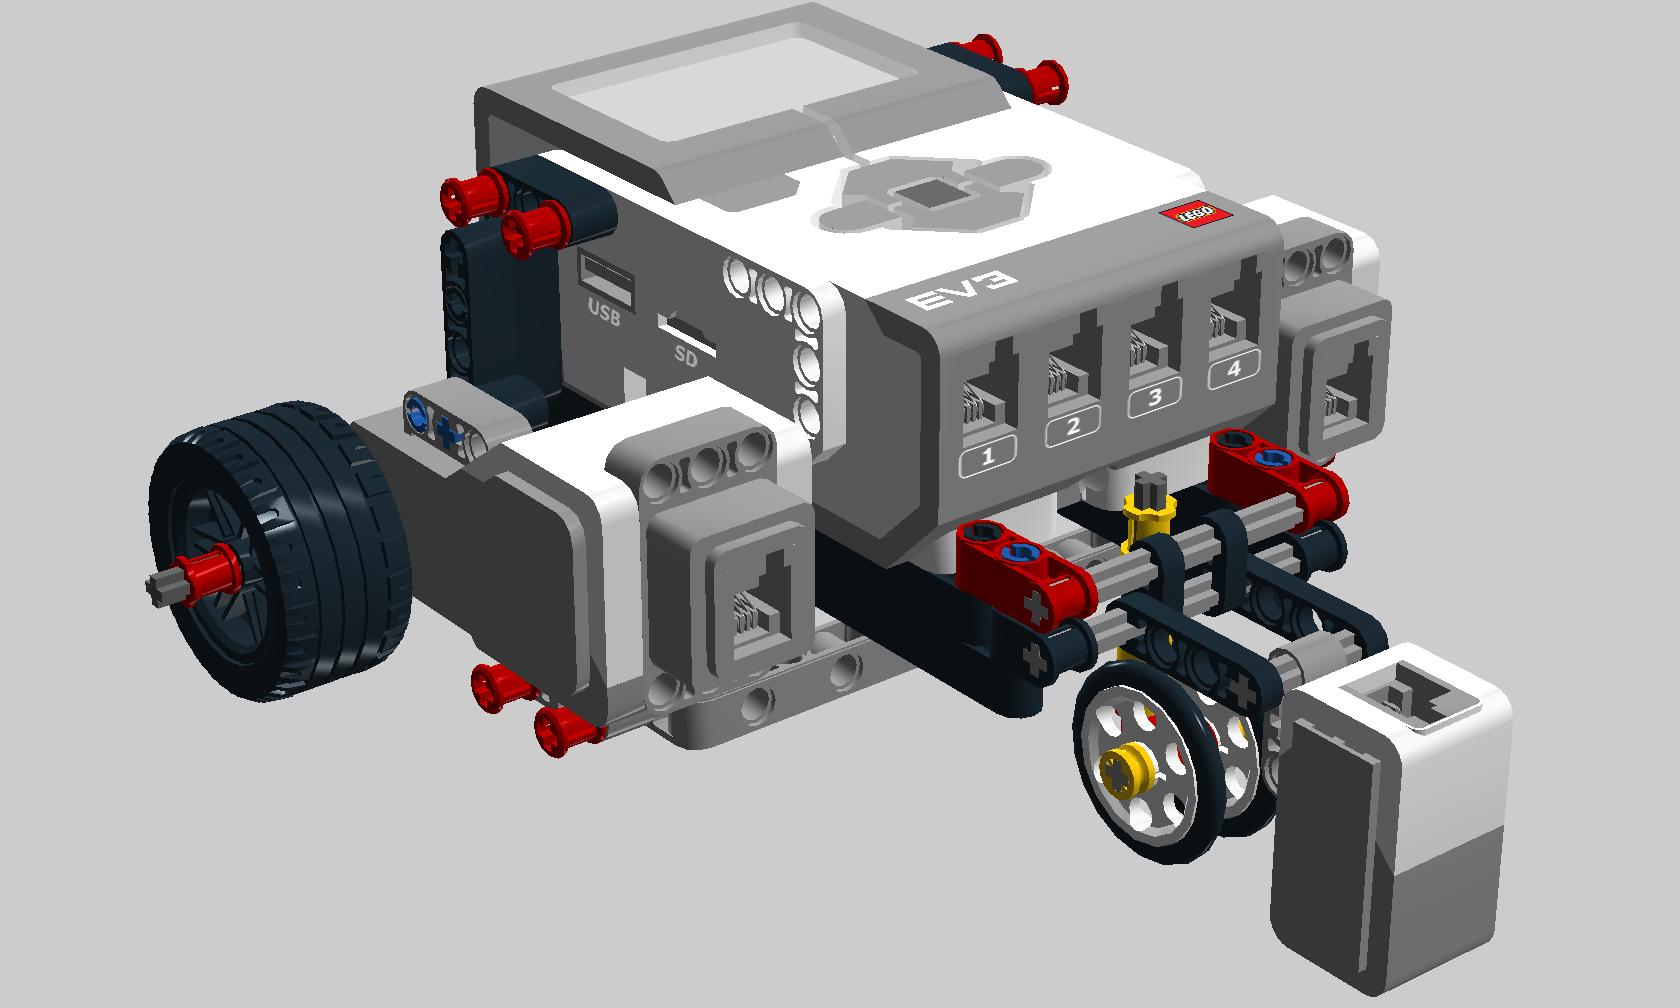 nxt robot building instructions pdf